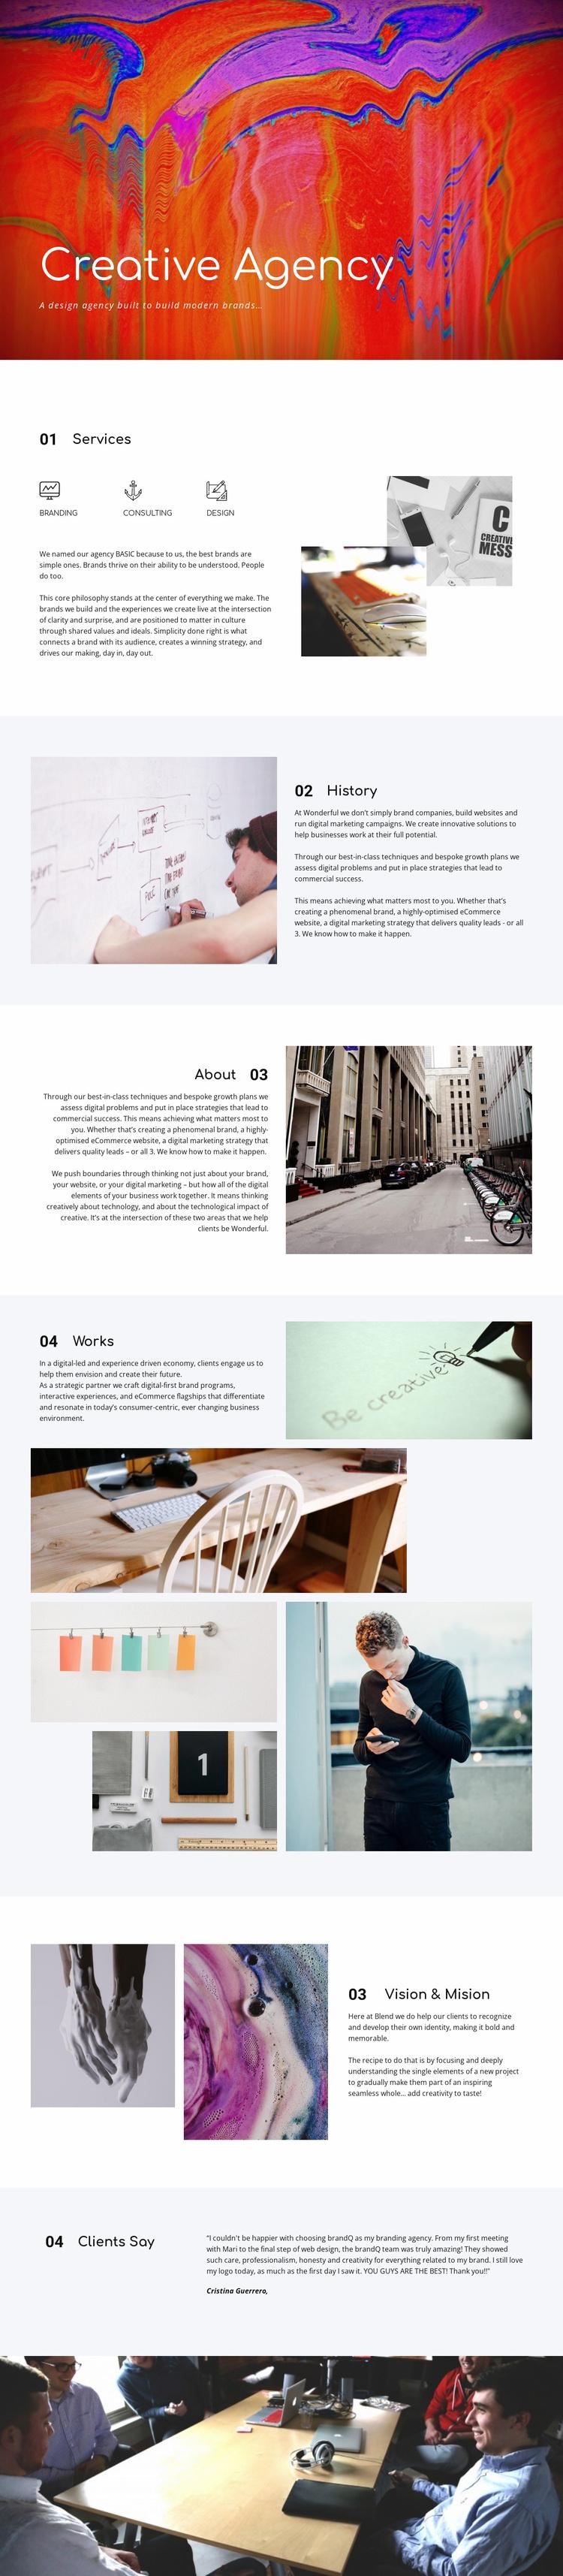 Creative gallery Website Template